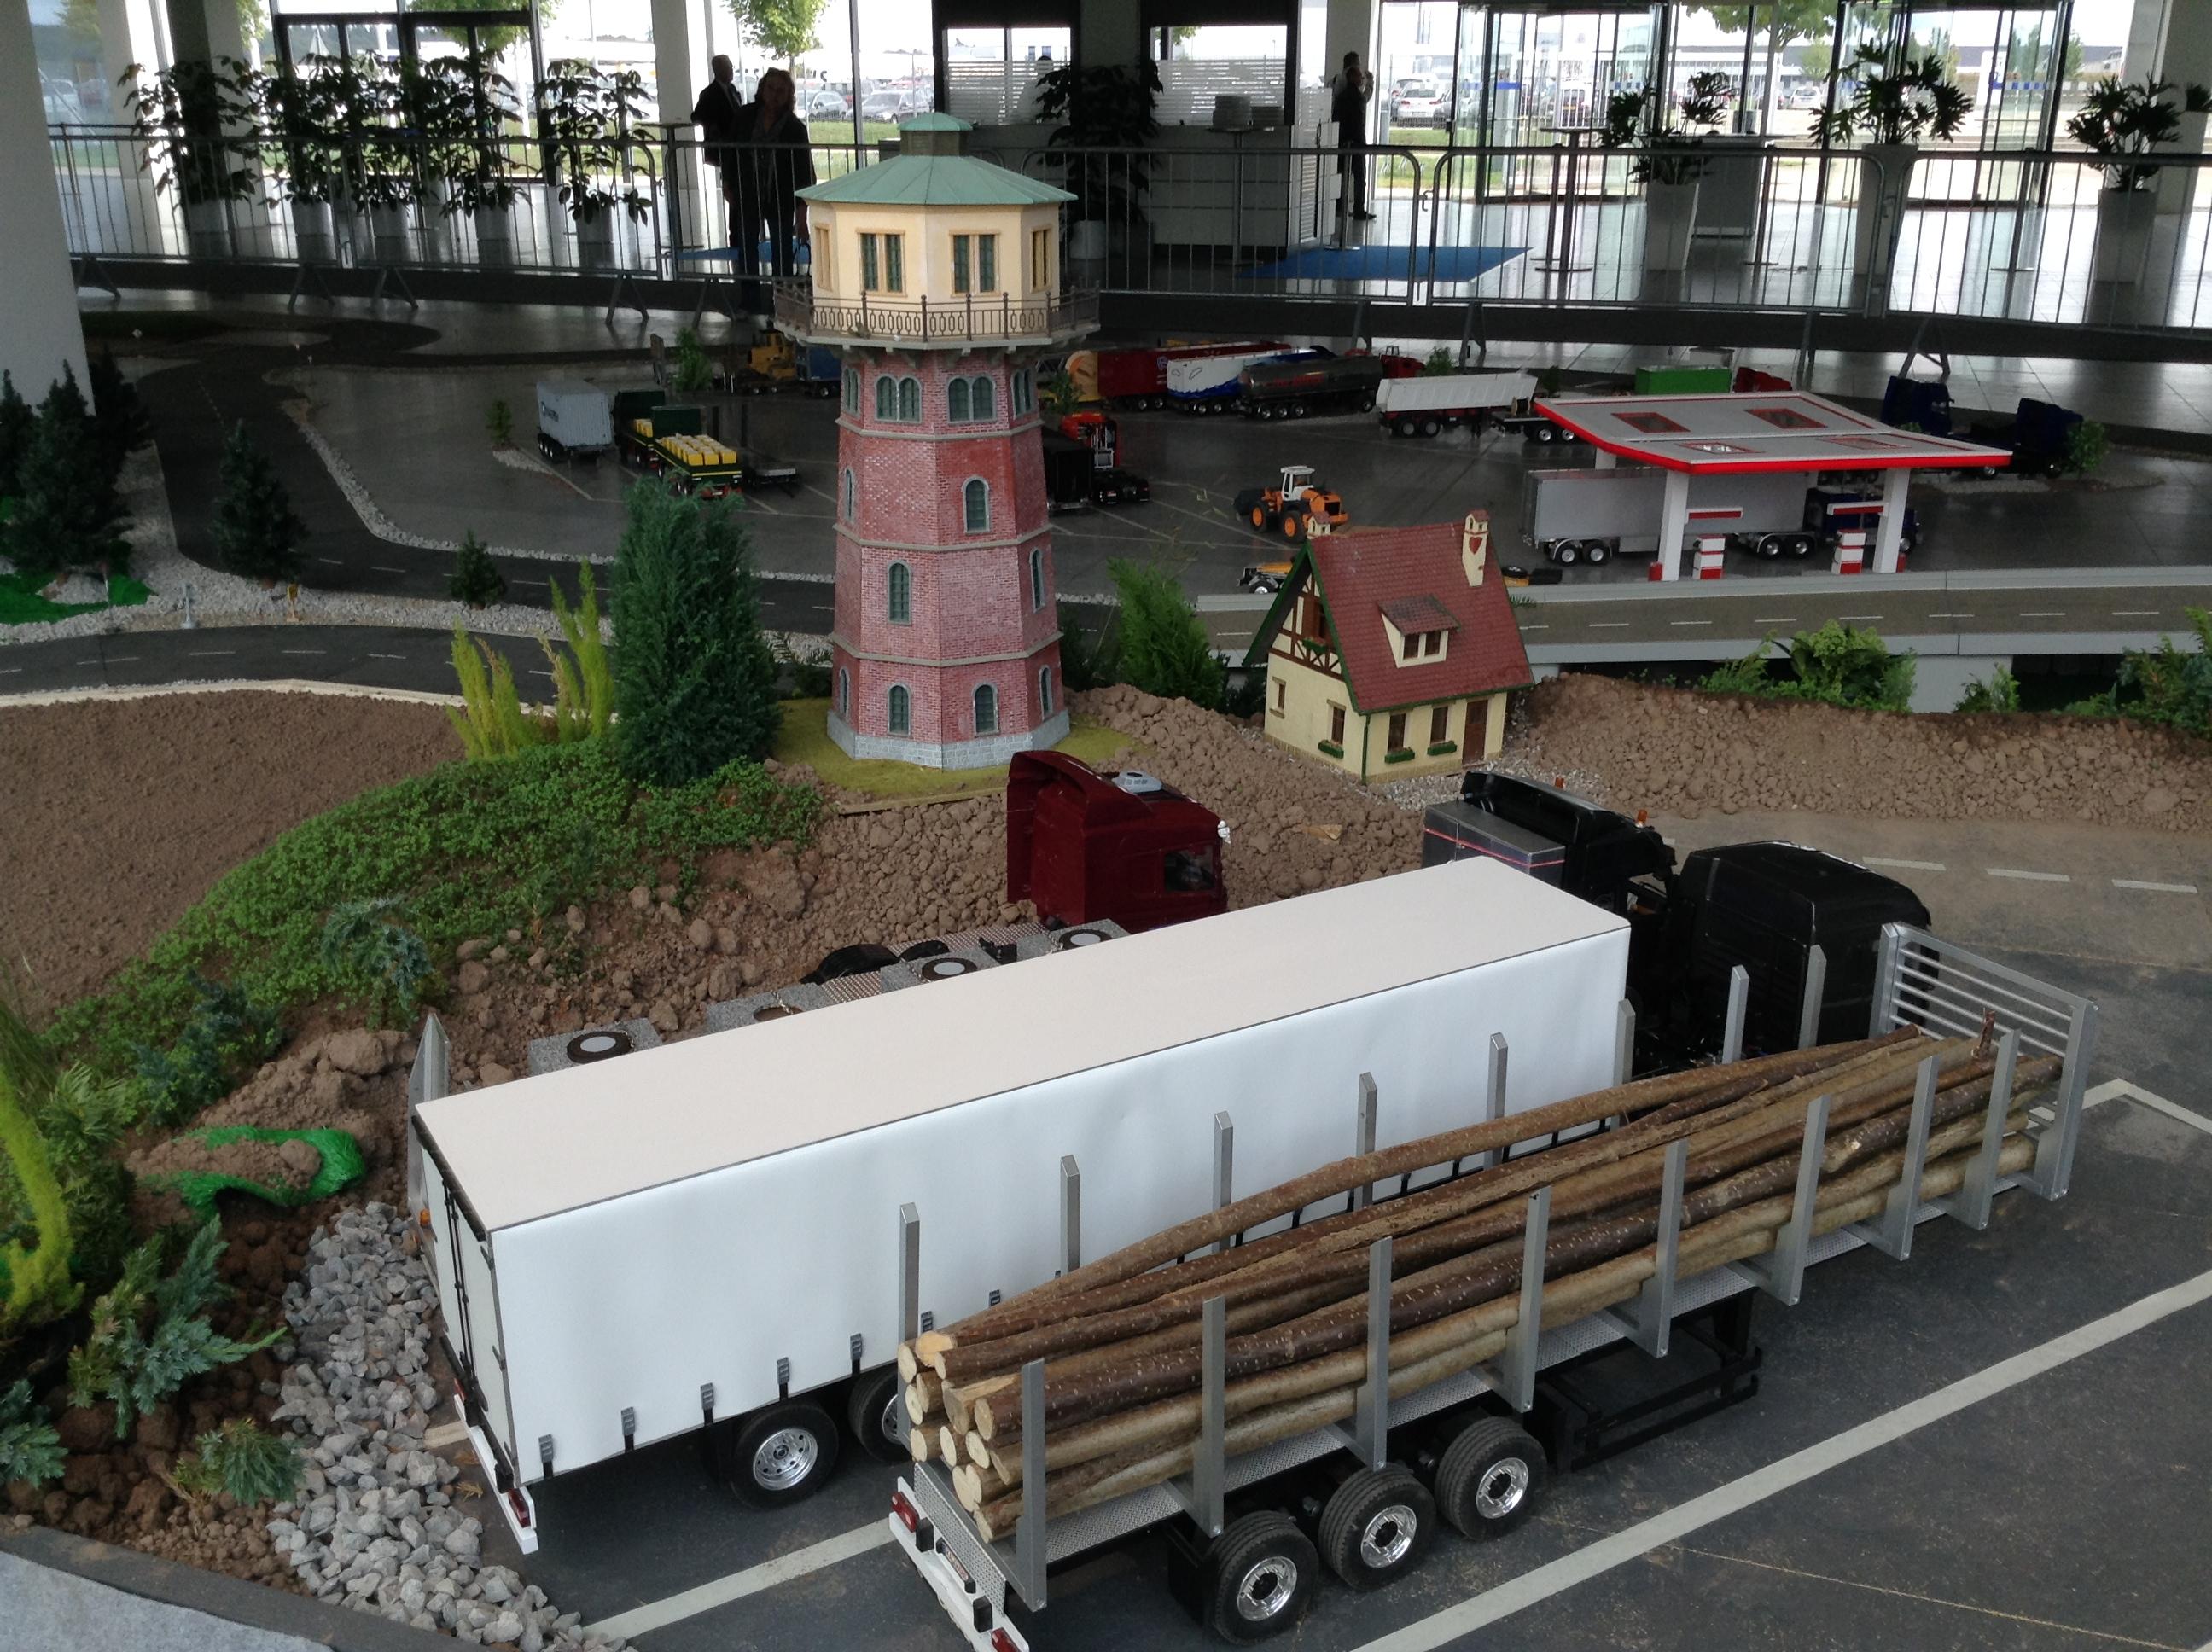 Trucks e Trailers.com